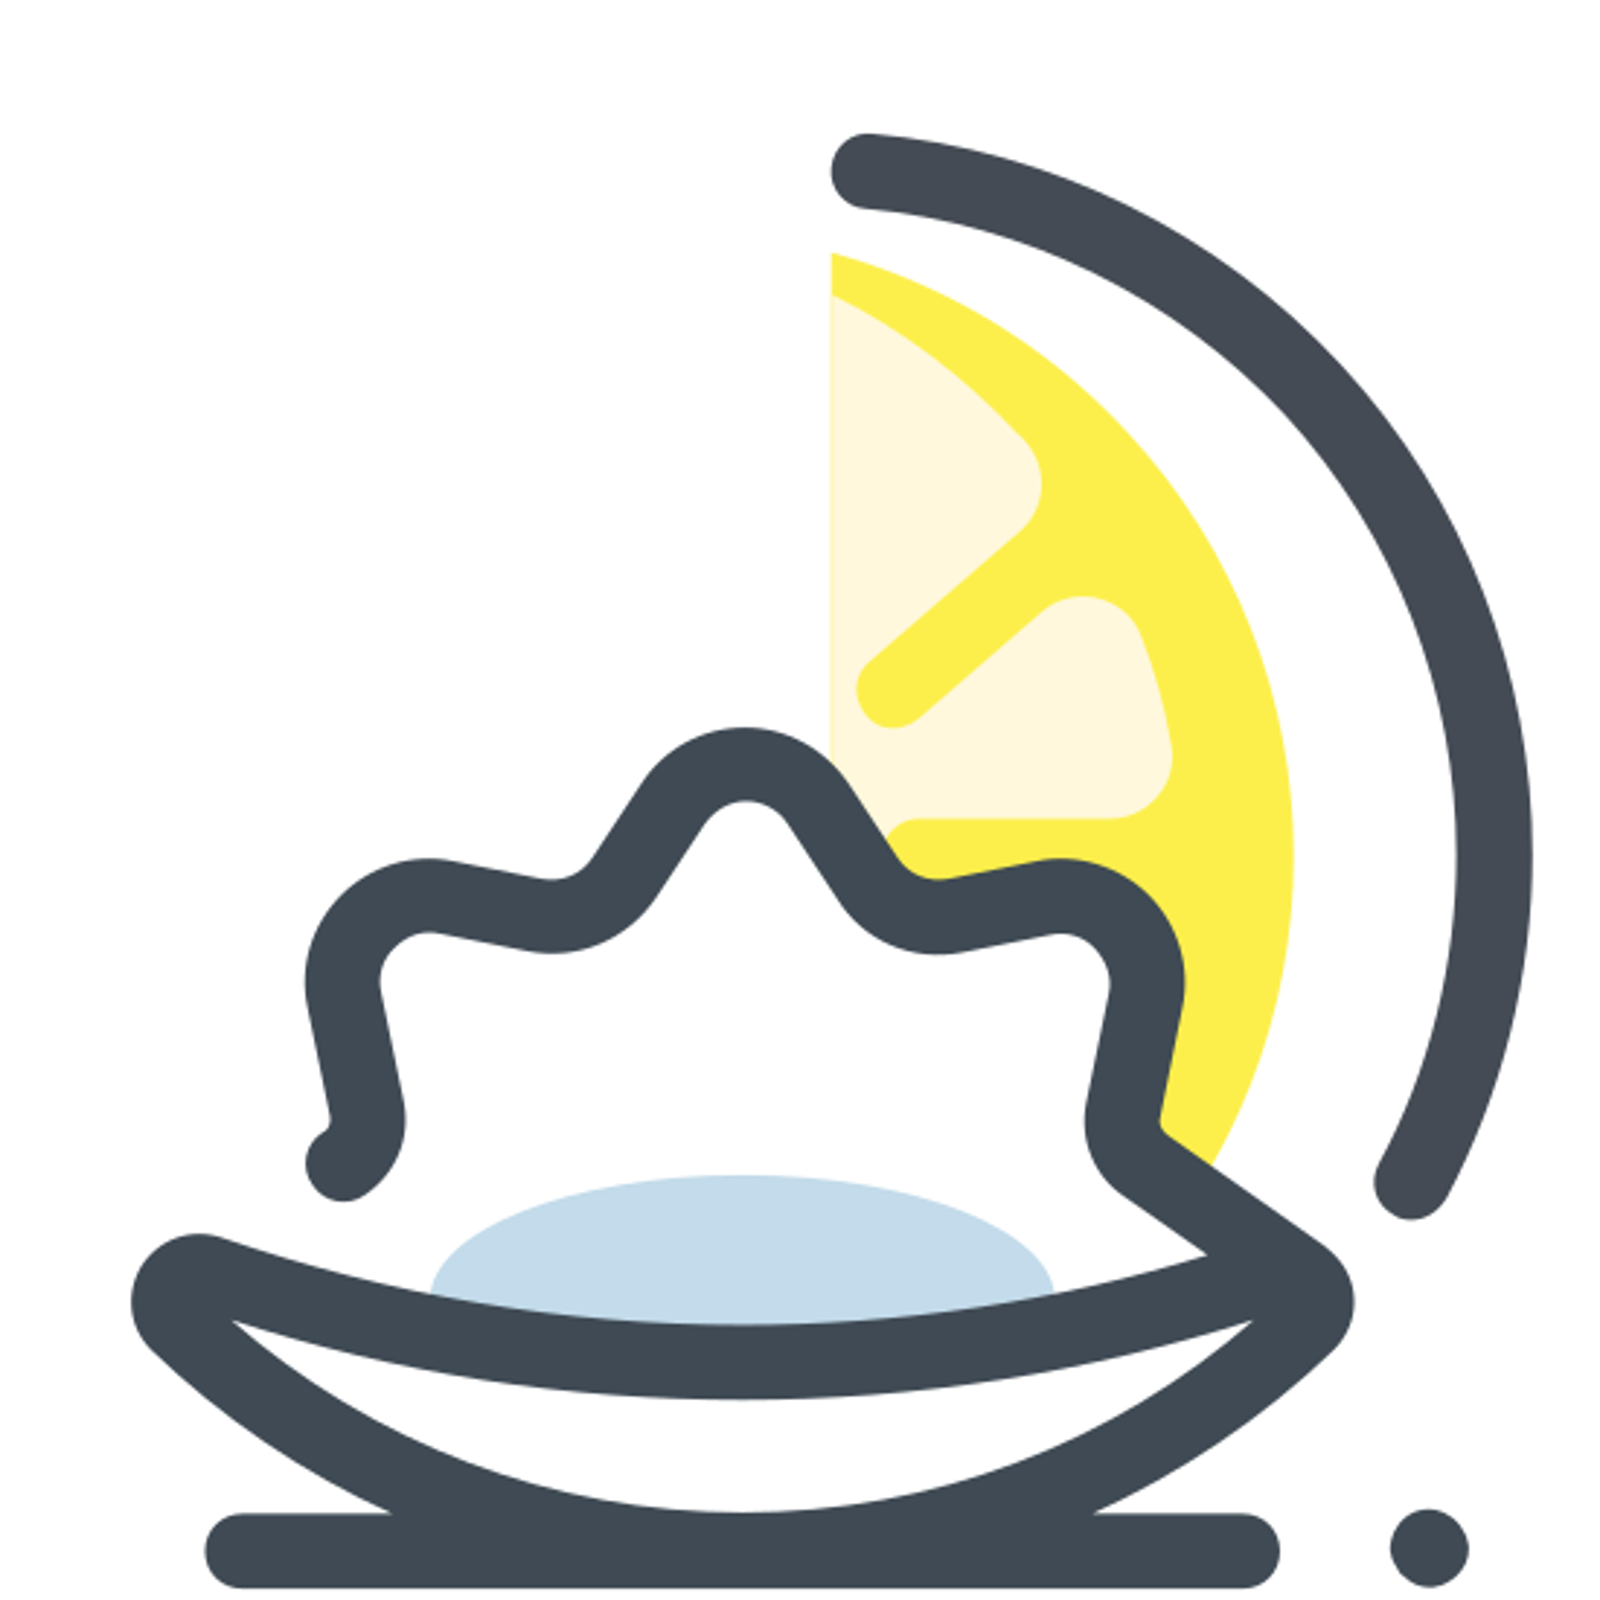 Ostrygi z cytryną icon